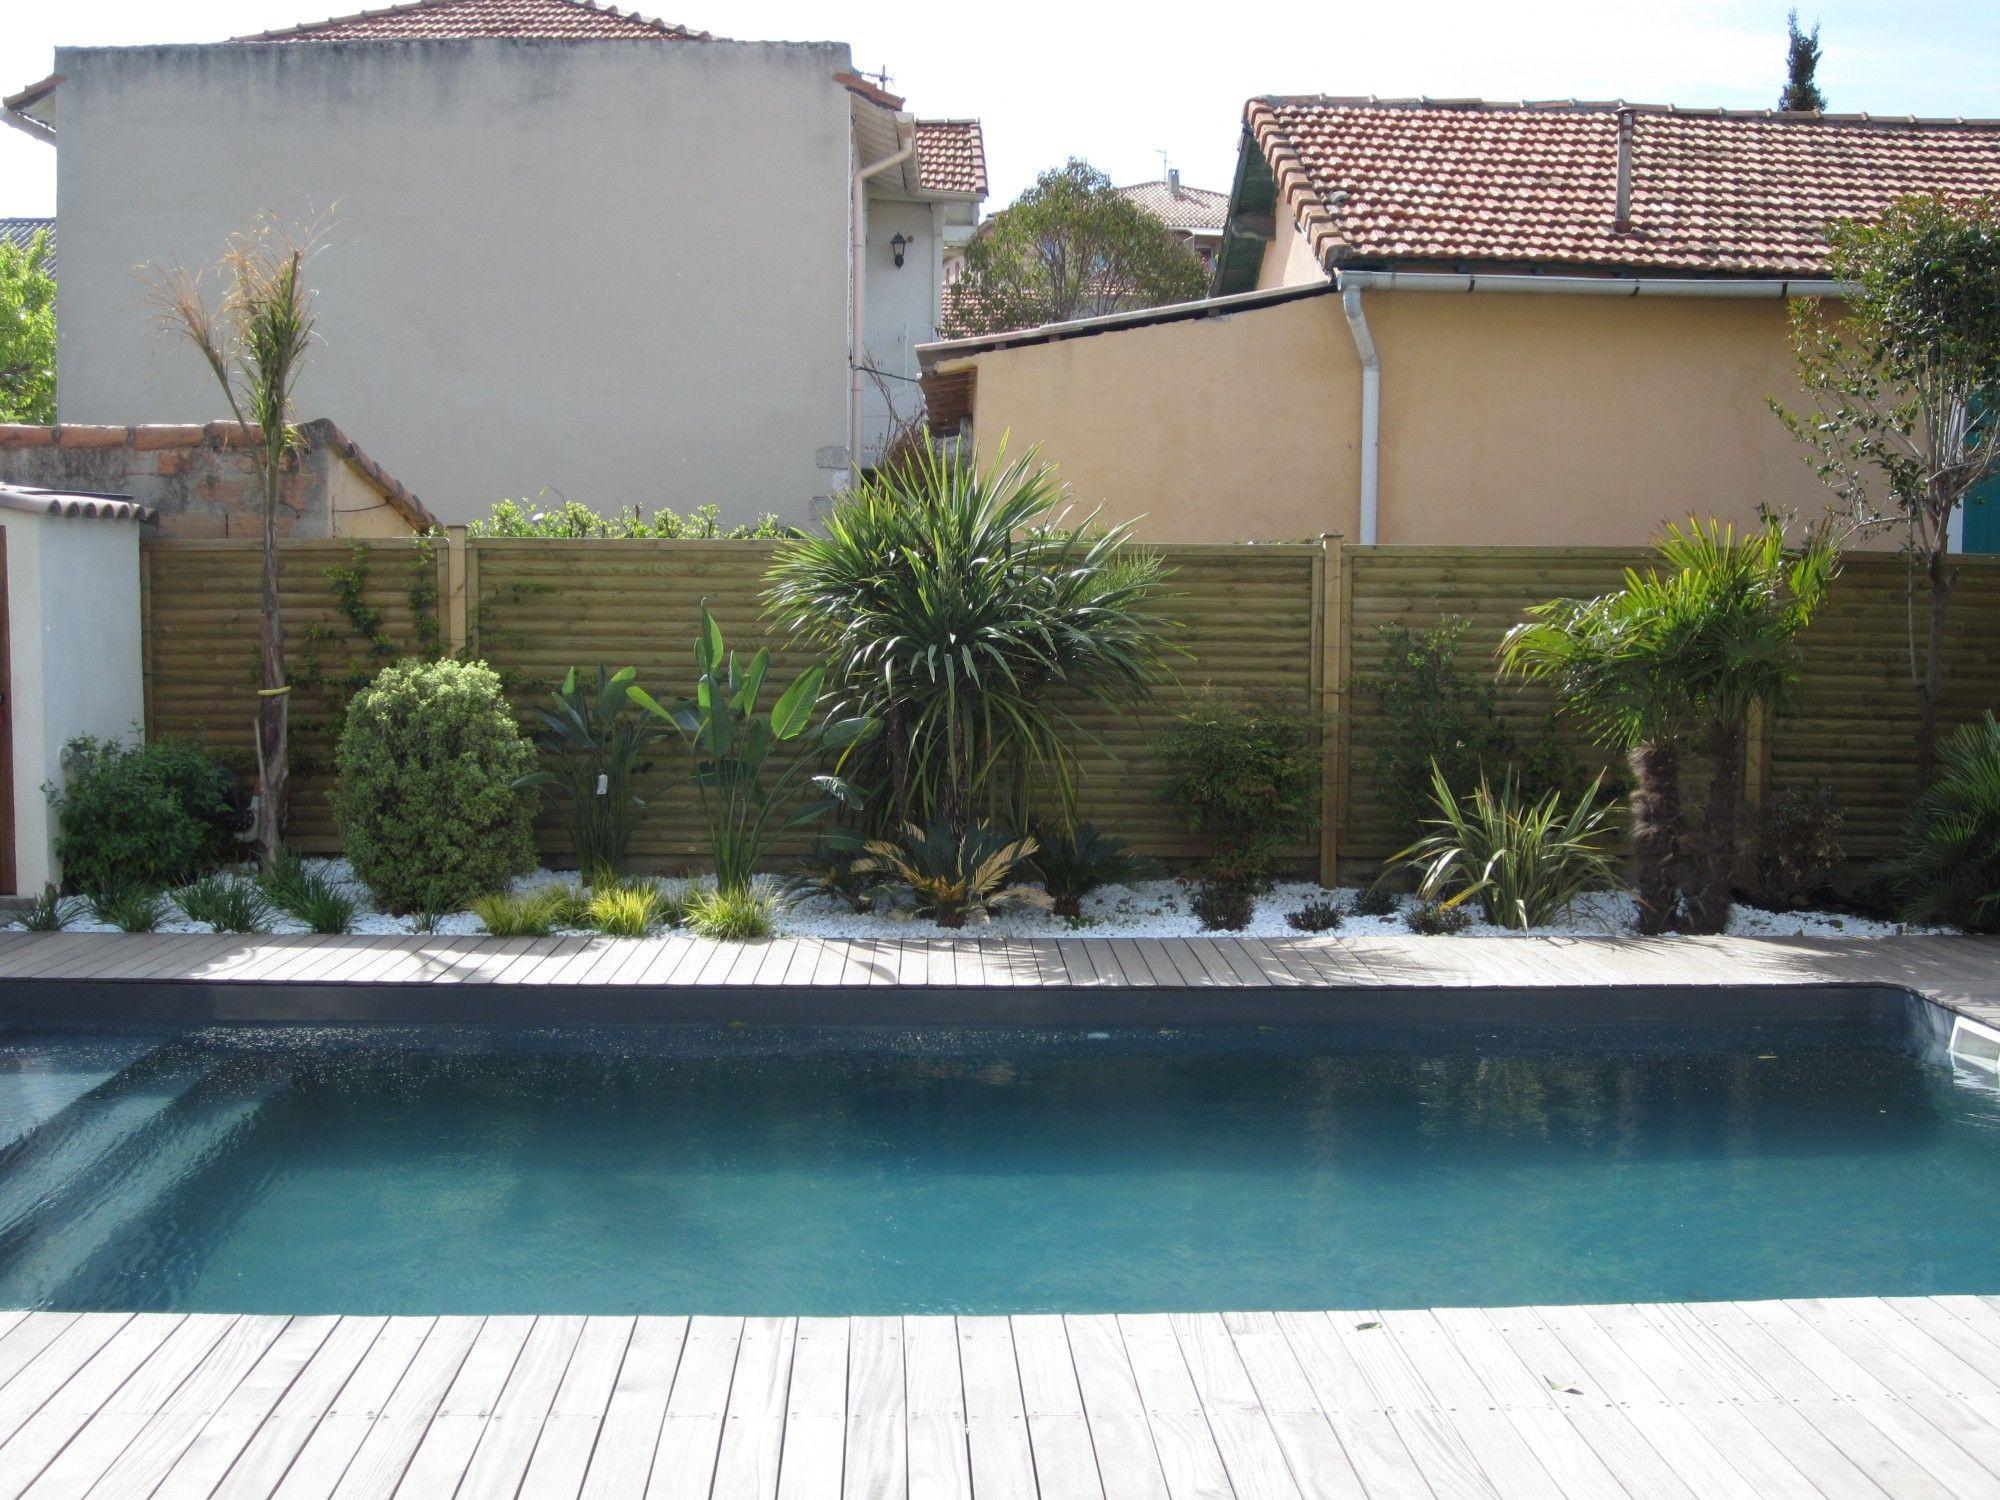 Amenagement piscine palmier - Amenagement terrasse piscine ...